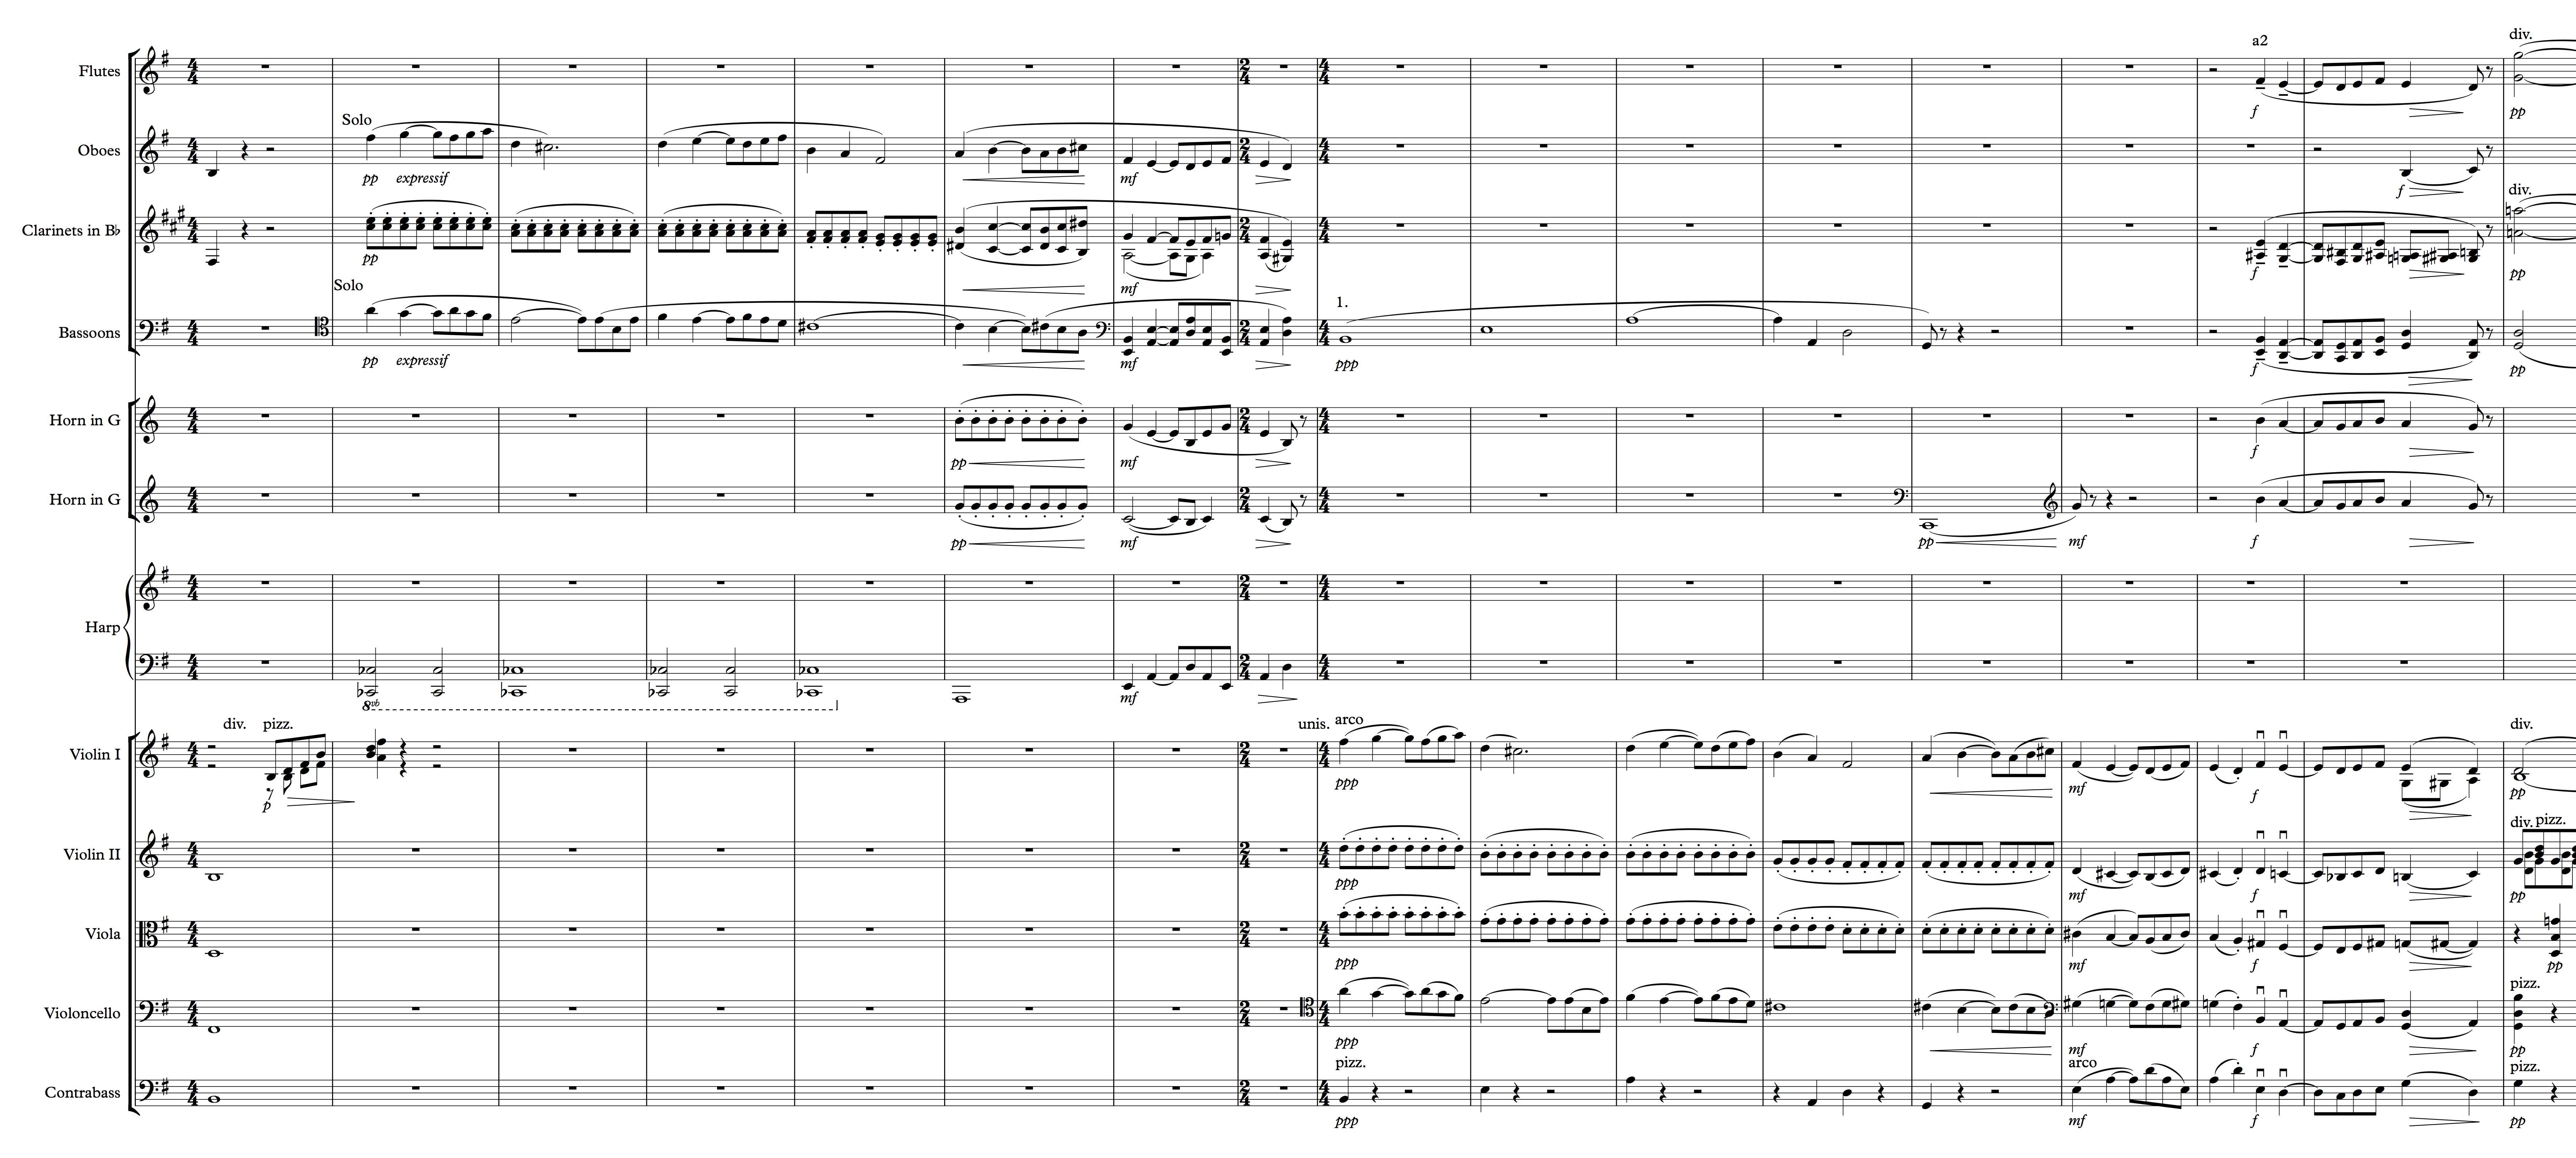 Maurice Ravel - Wikipedia